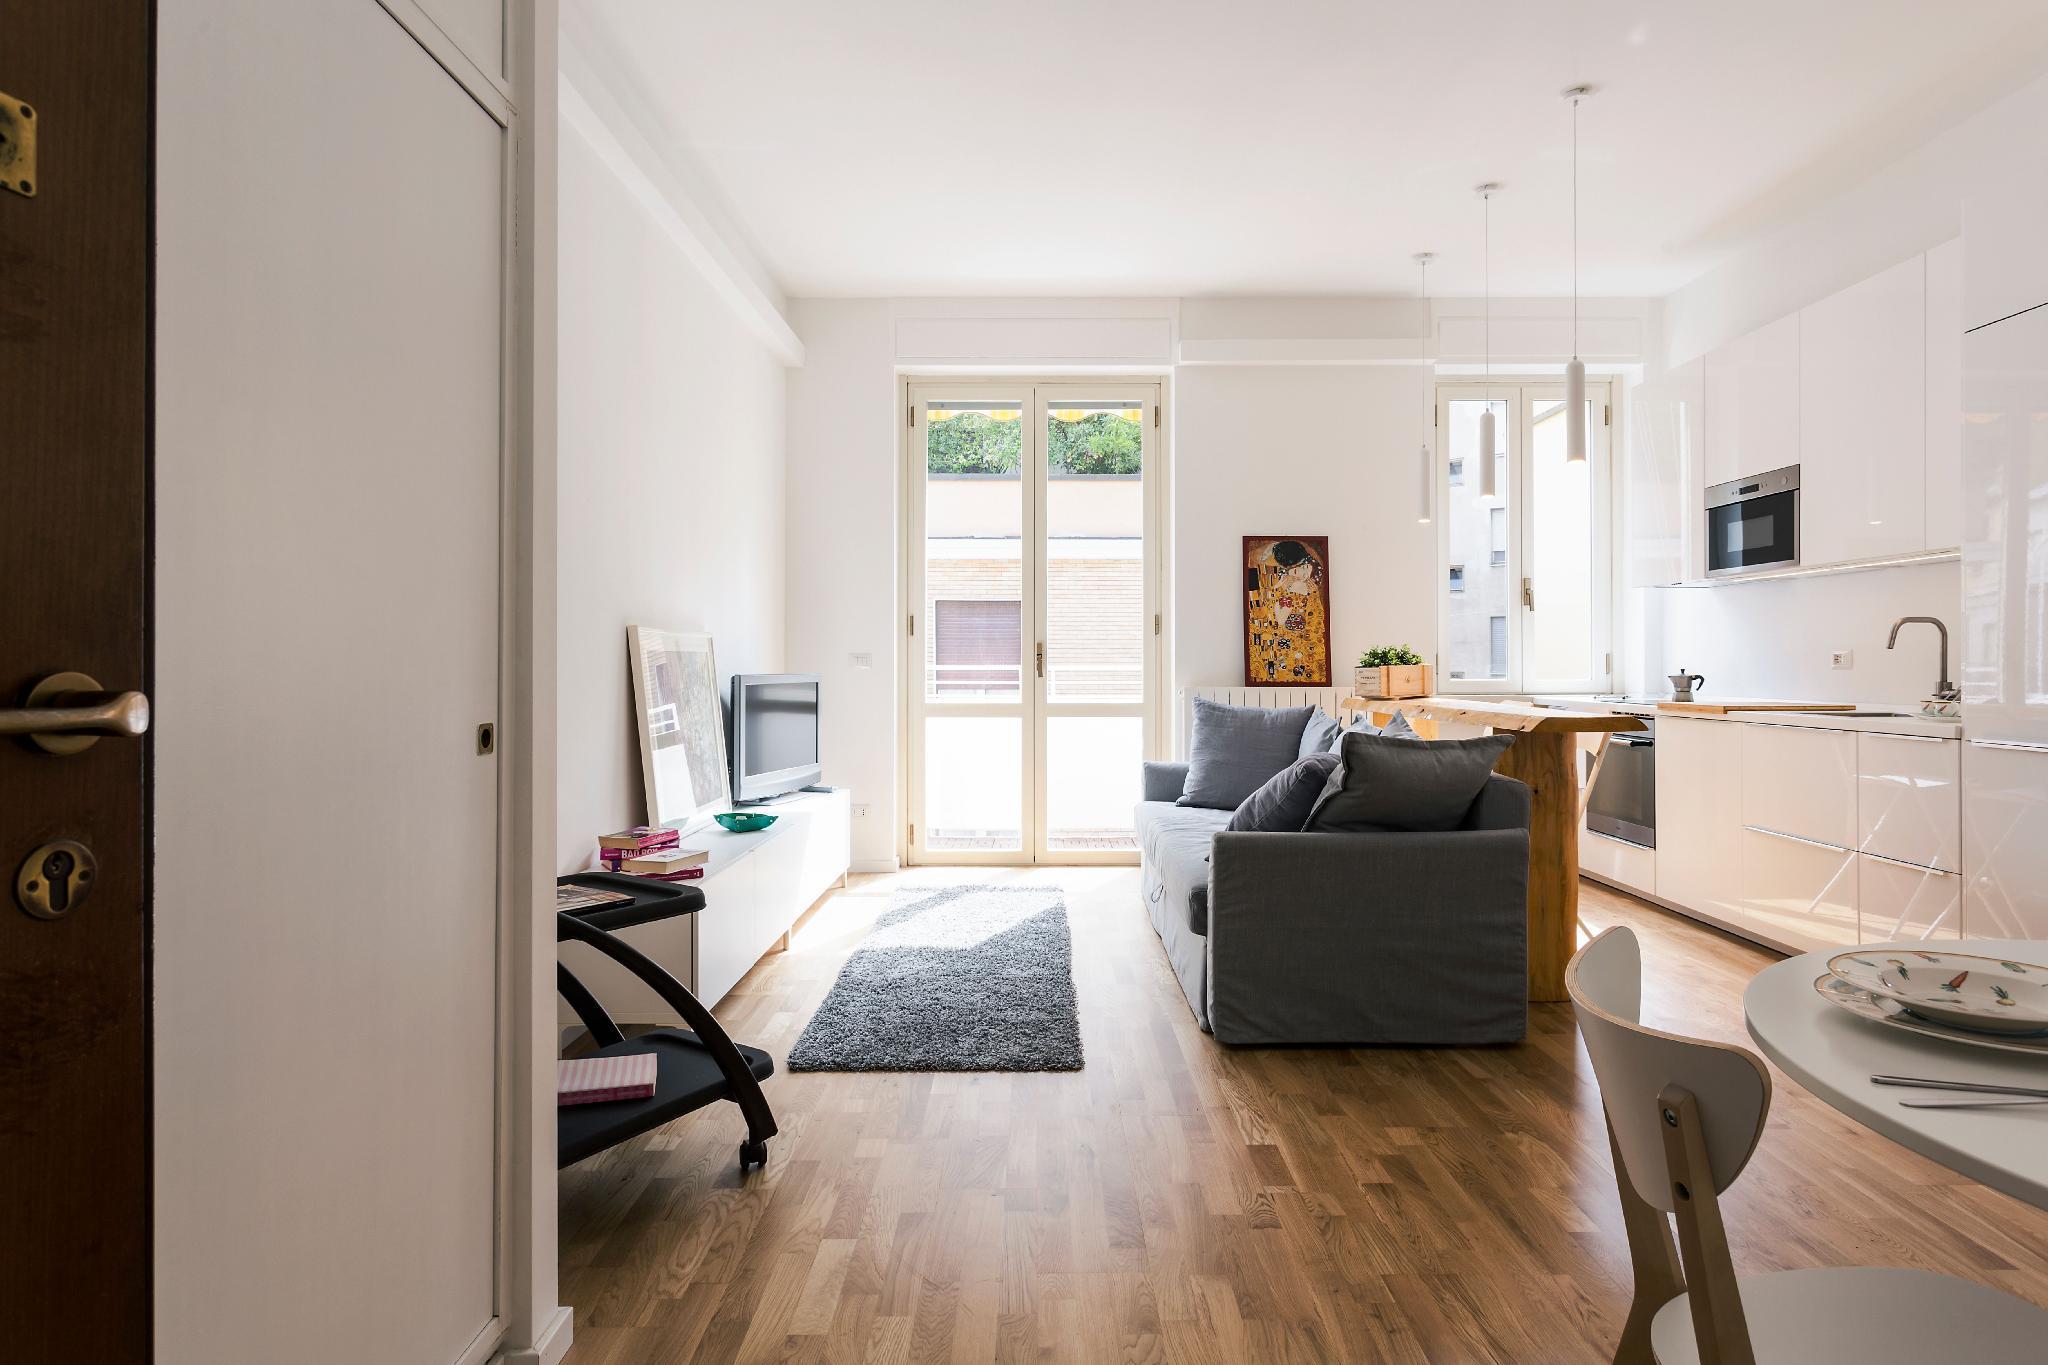 Bright and spacious 2 bedroom apartment-sapeto7 3p